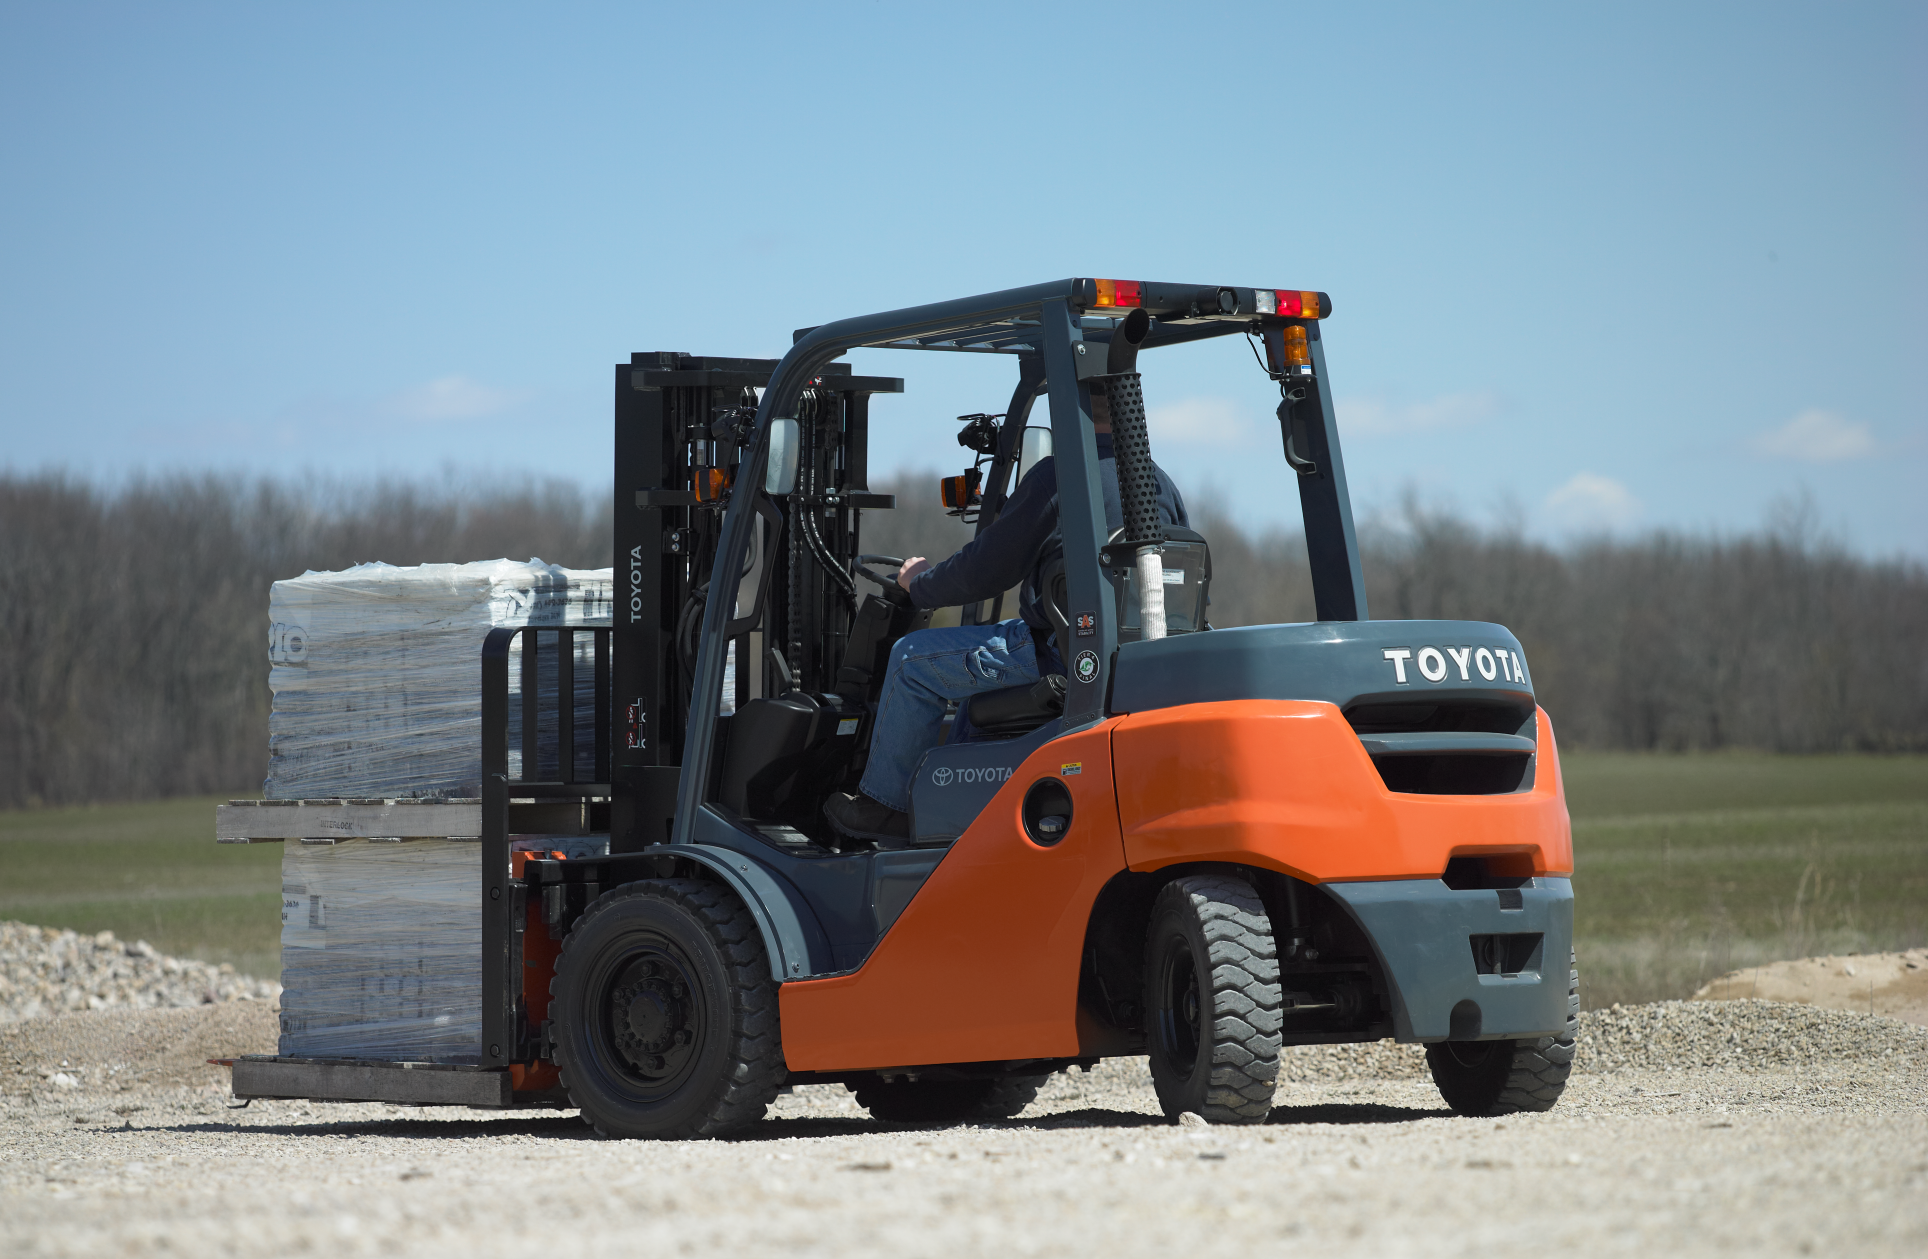 Toyota Pneumatic Forklift